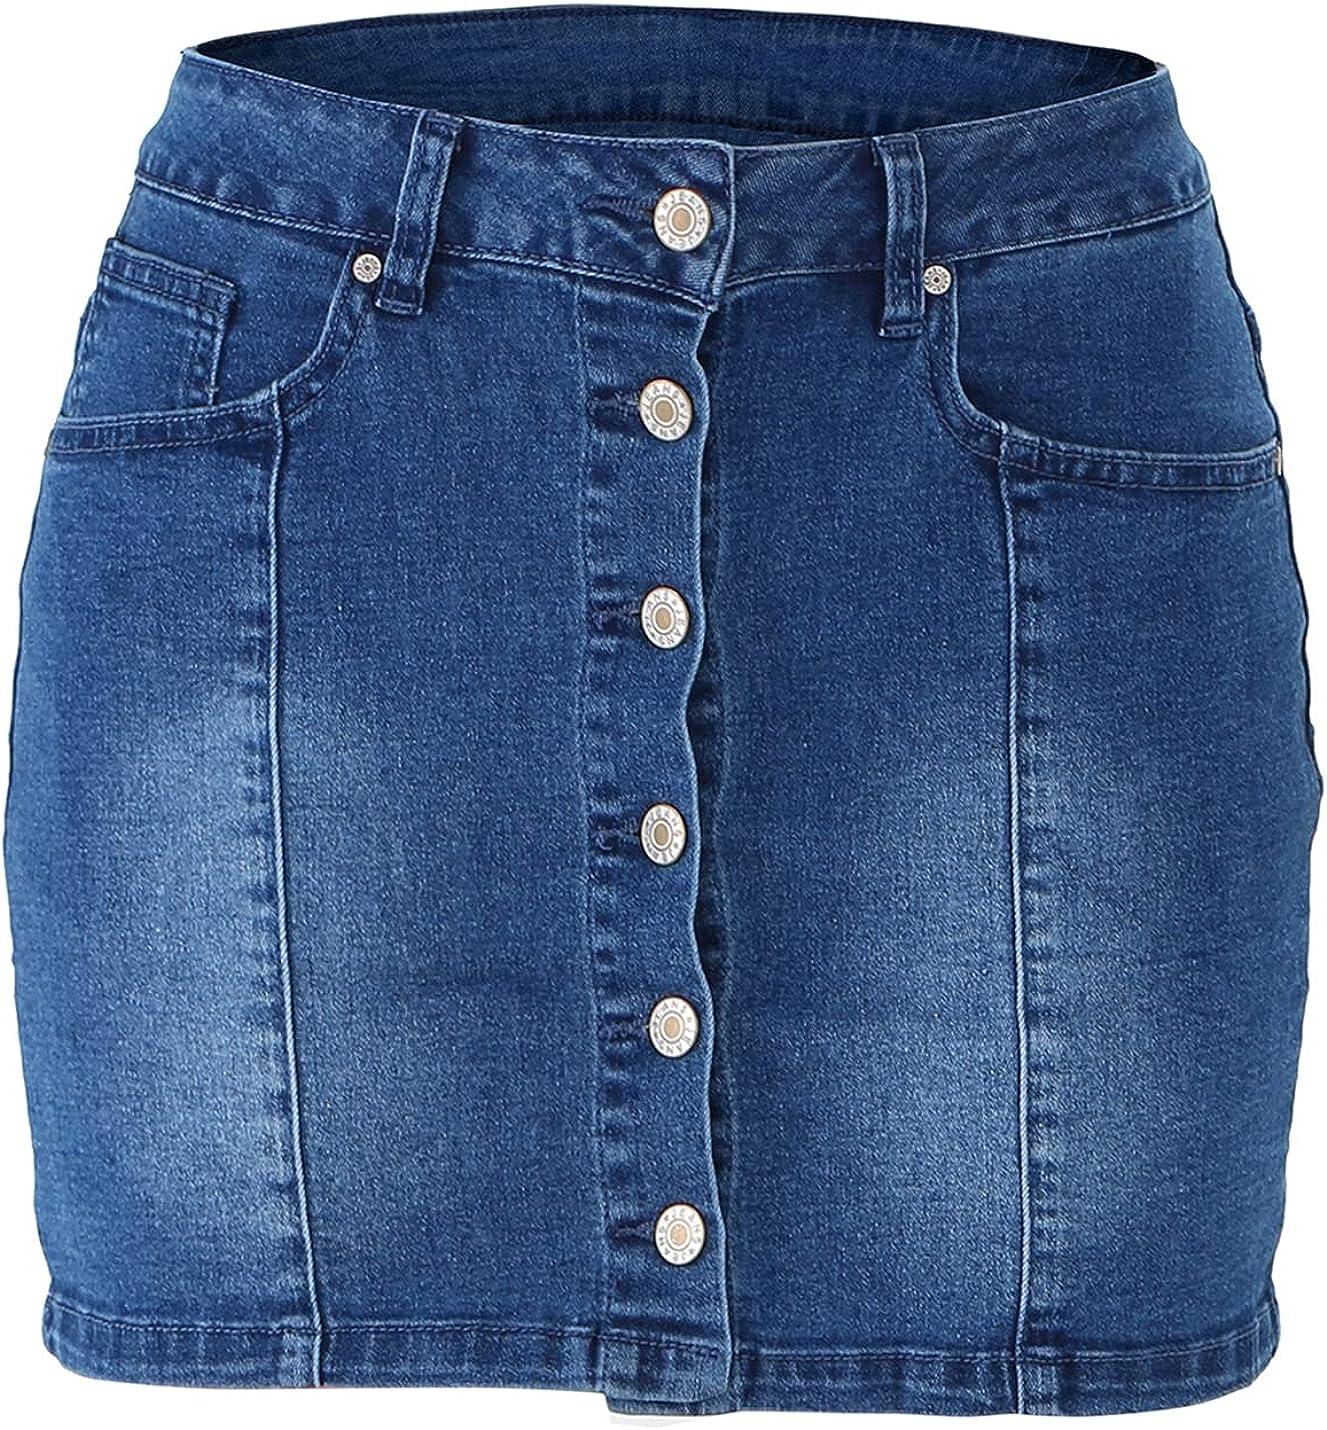 IKIIO Women's Fashion Casual High Waisted Slim Fit Denim Skirt A Line Skirts with Pockets